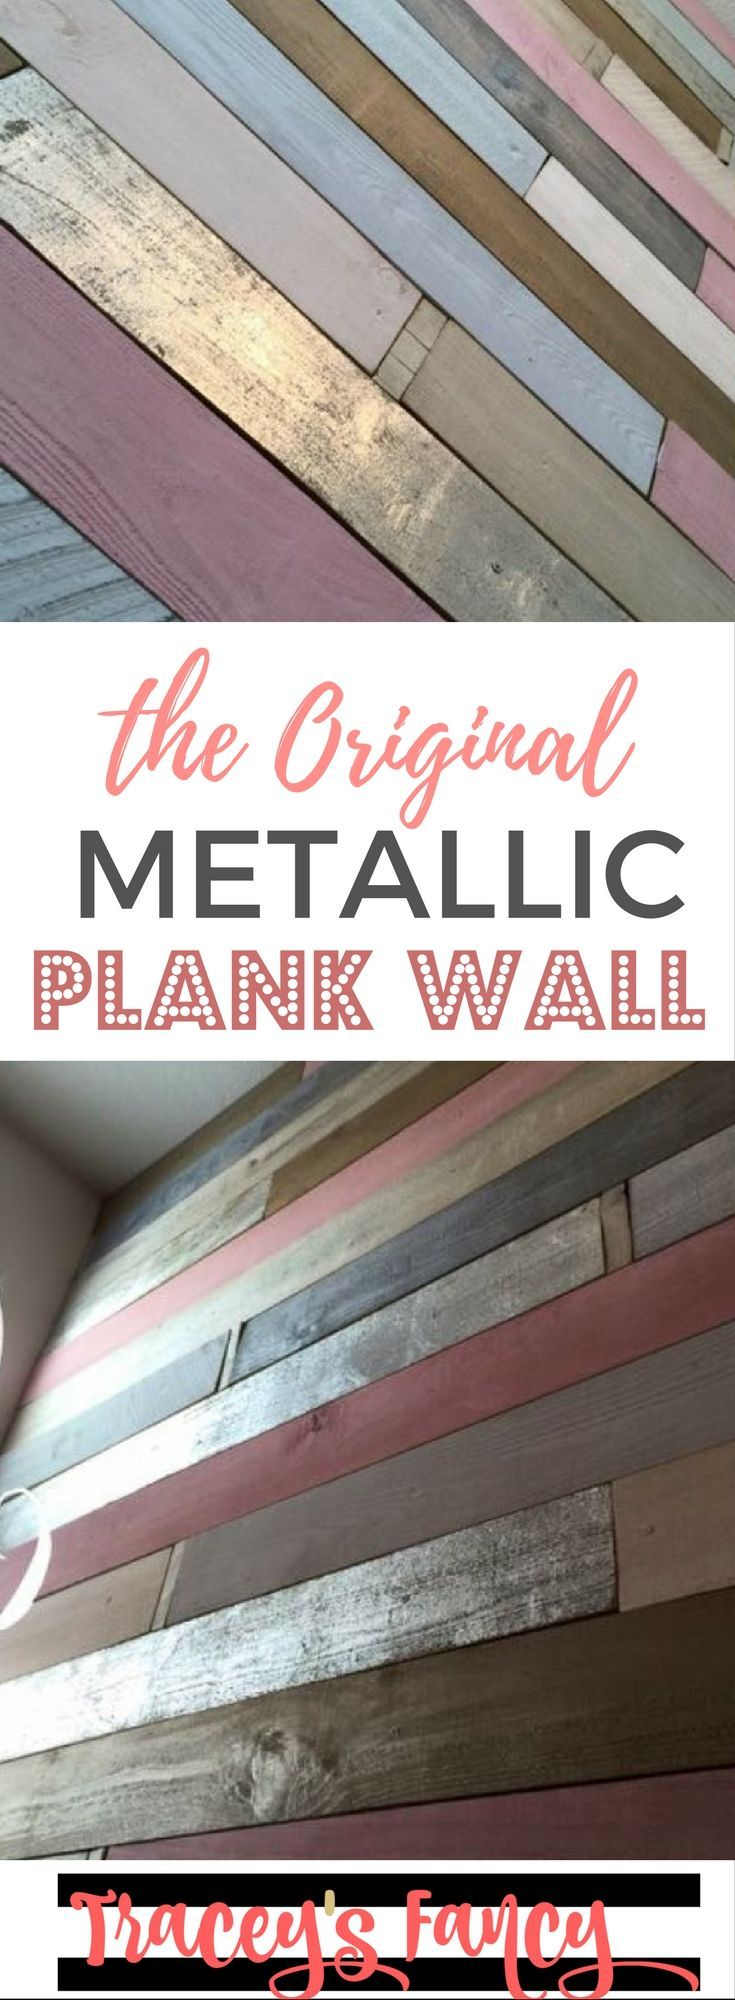 Pin it: The Original Metallic Plank Wal   Tracey's Fancy